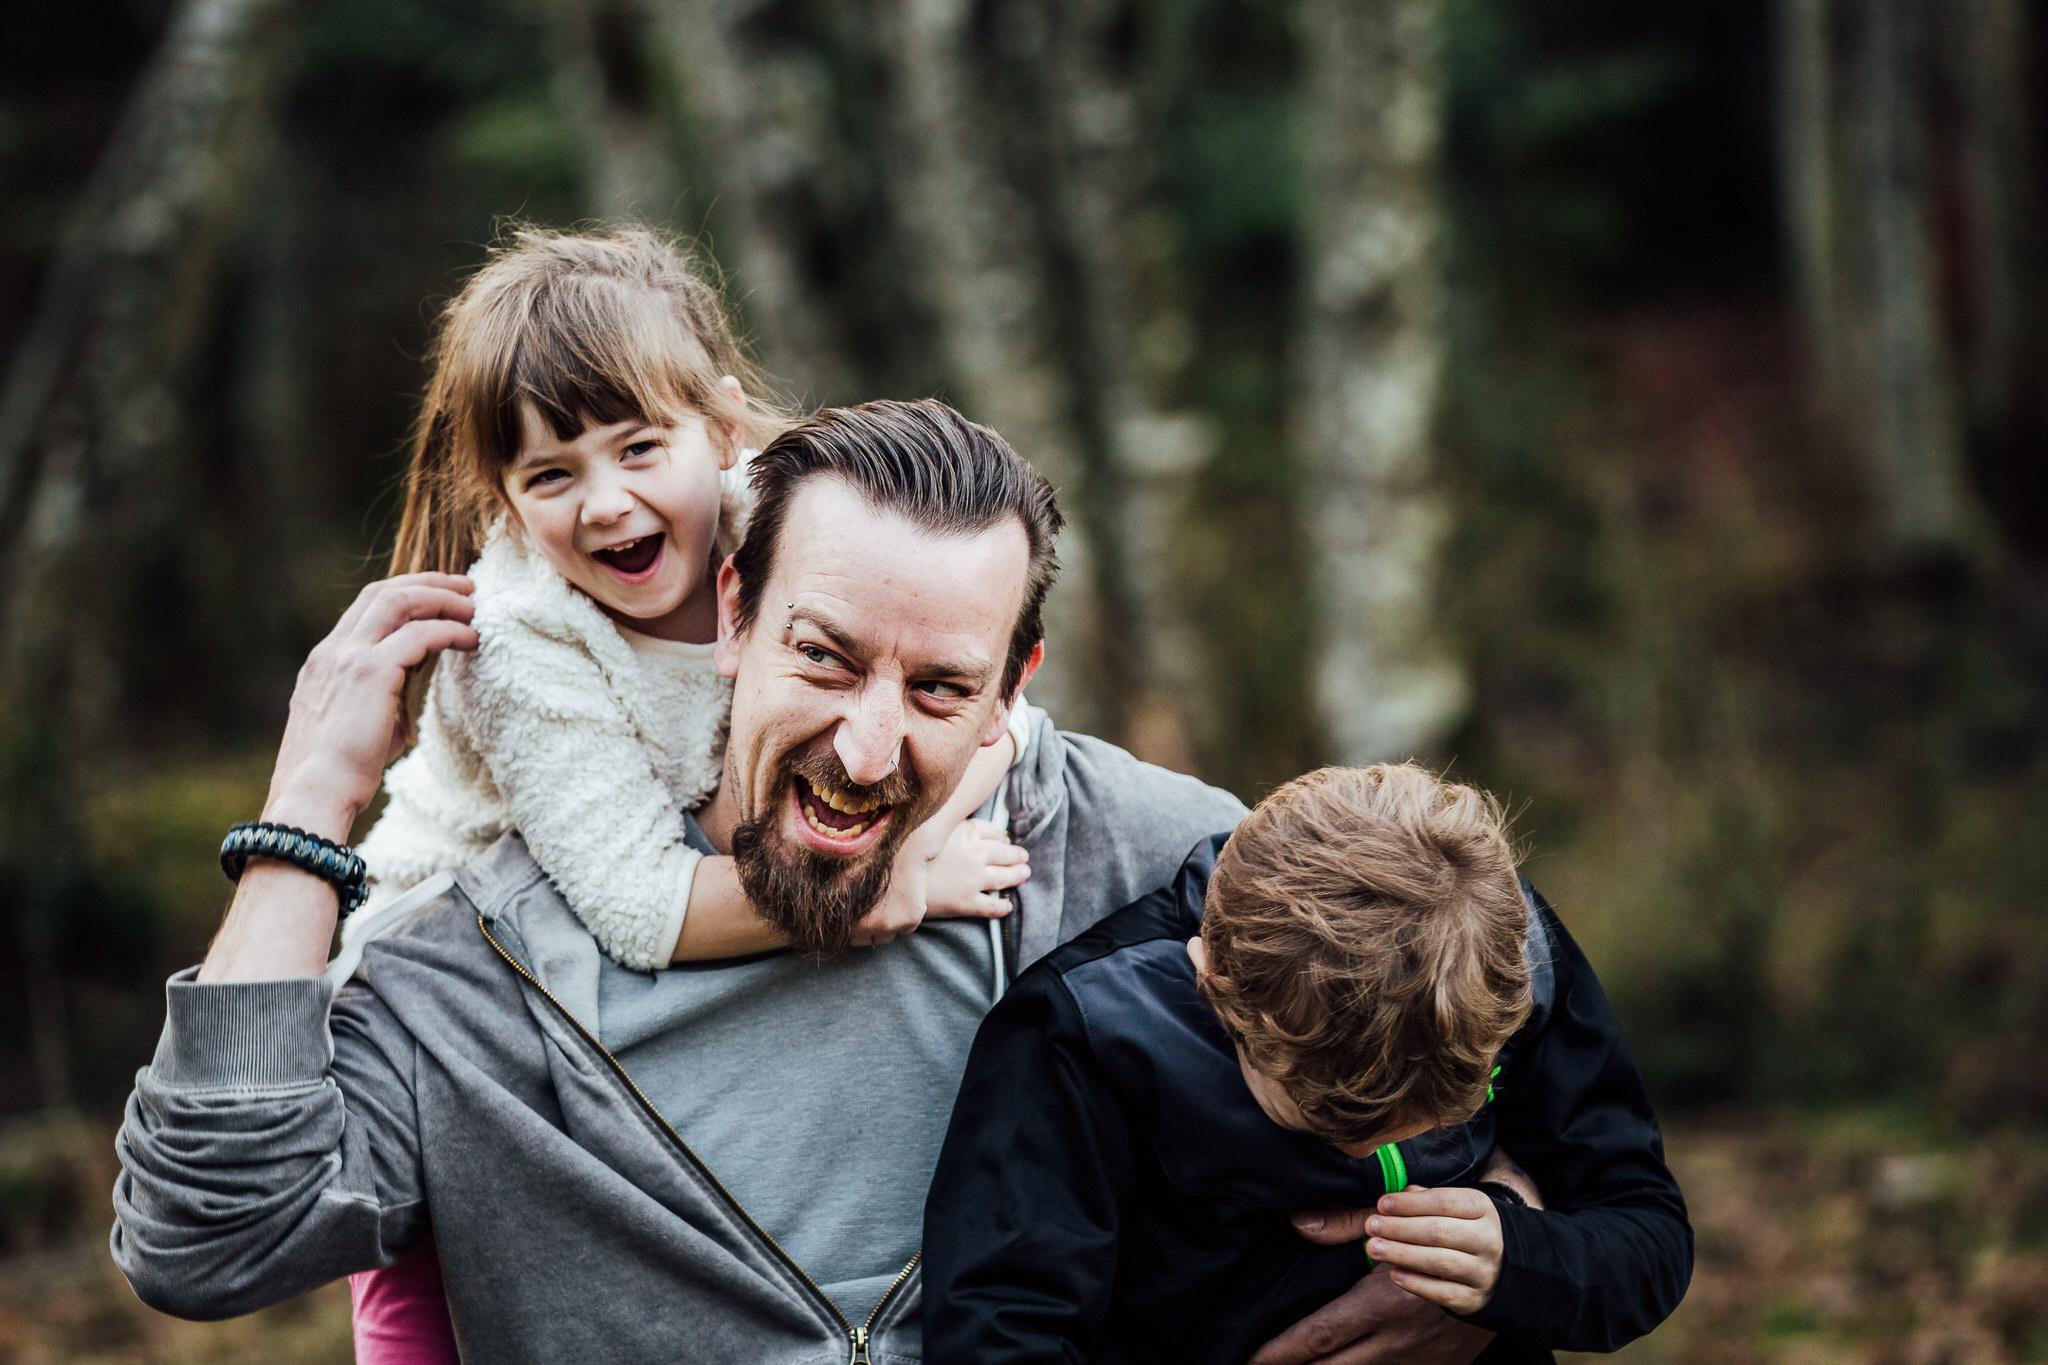 Chilliwack-Abbotsford-Family- Photographer- 34.jpg